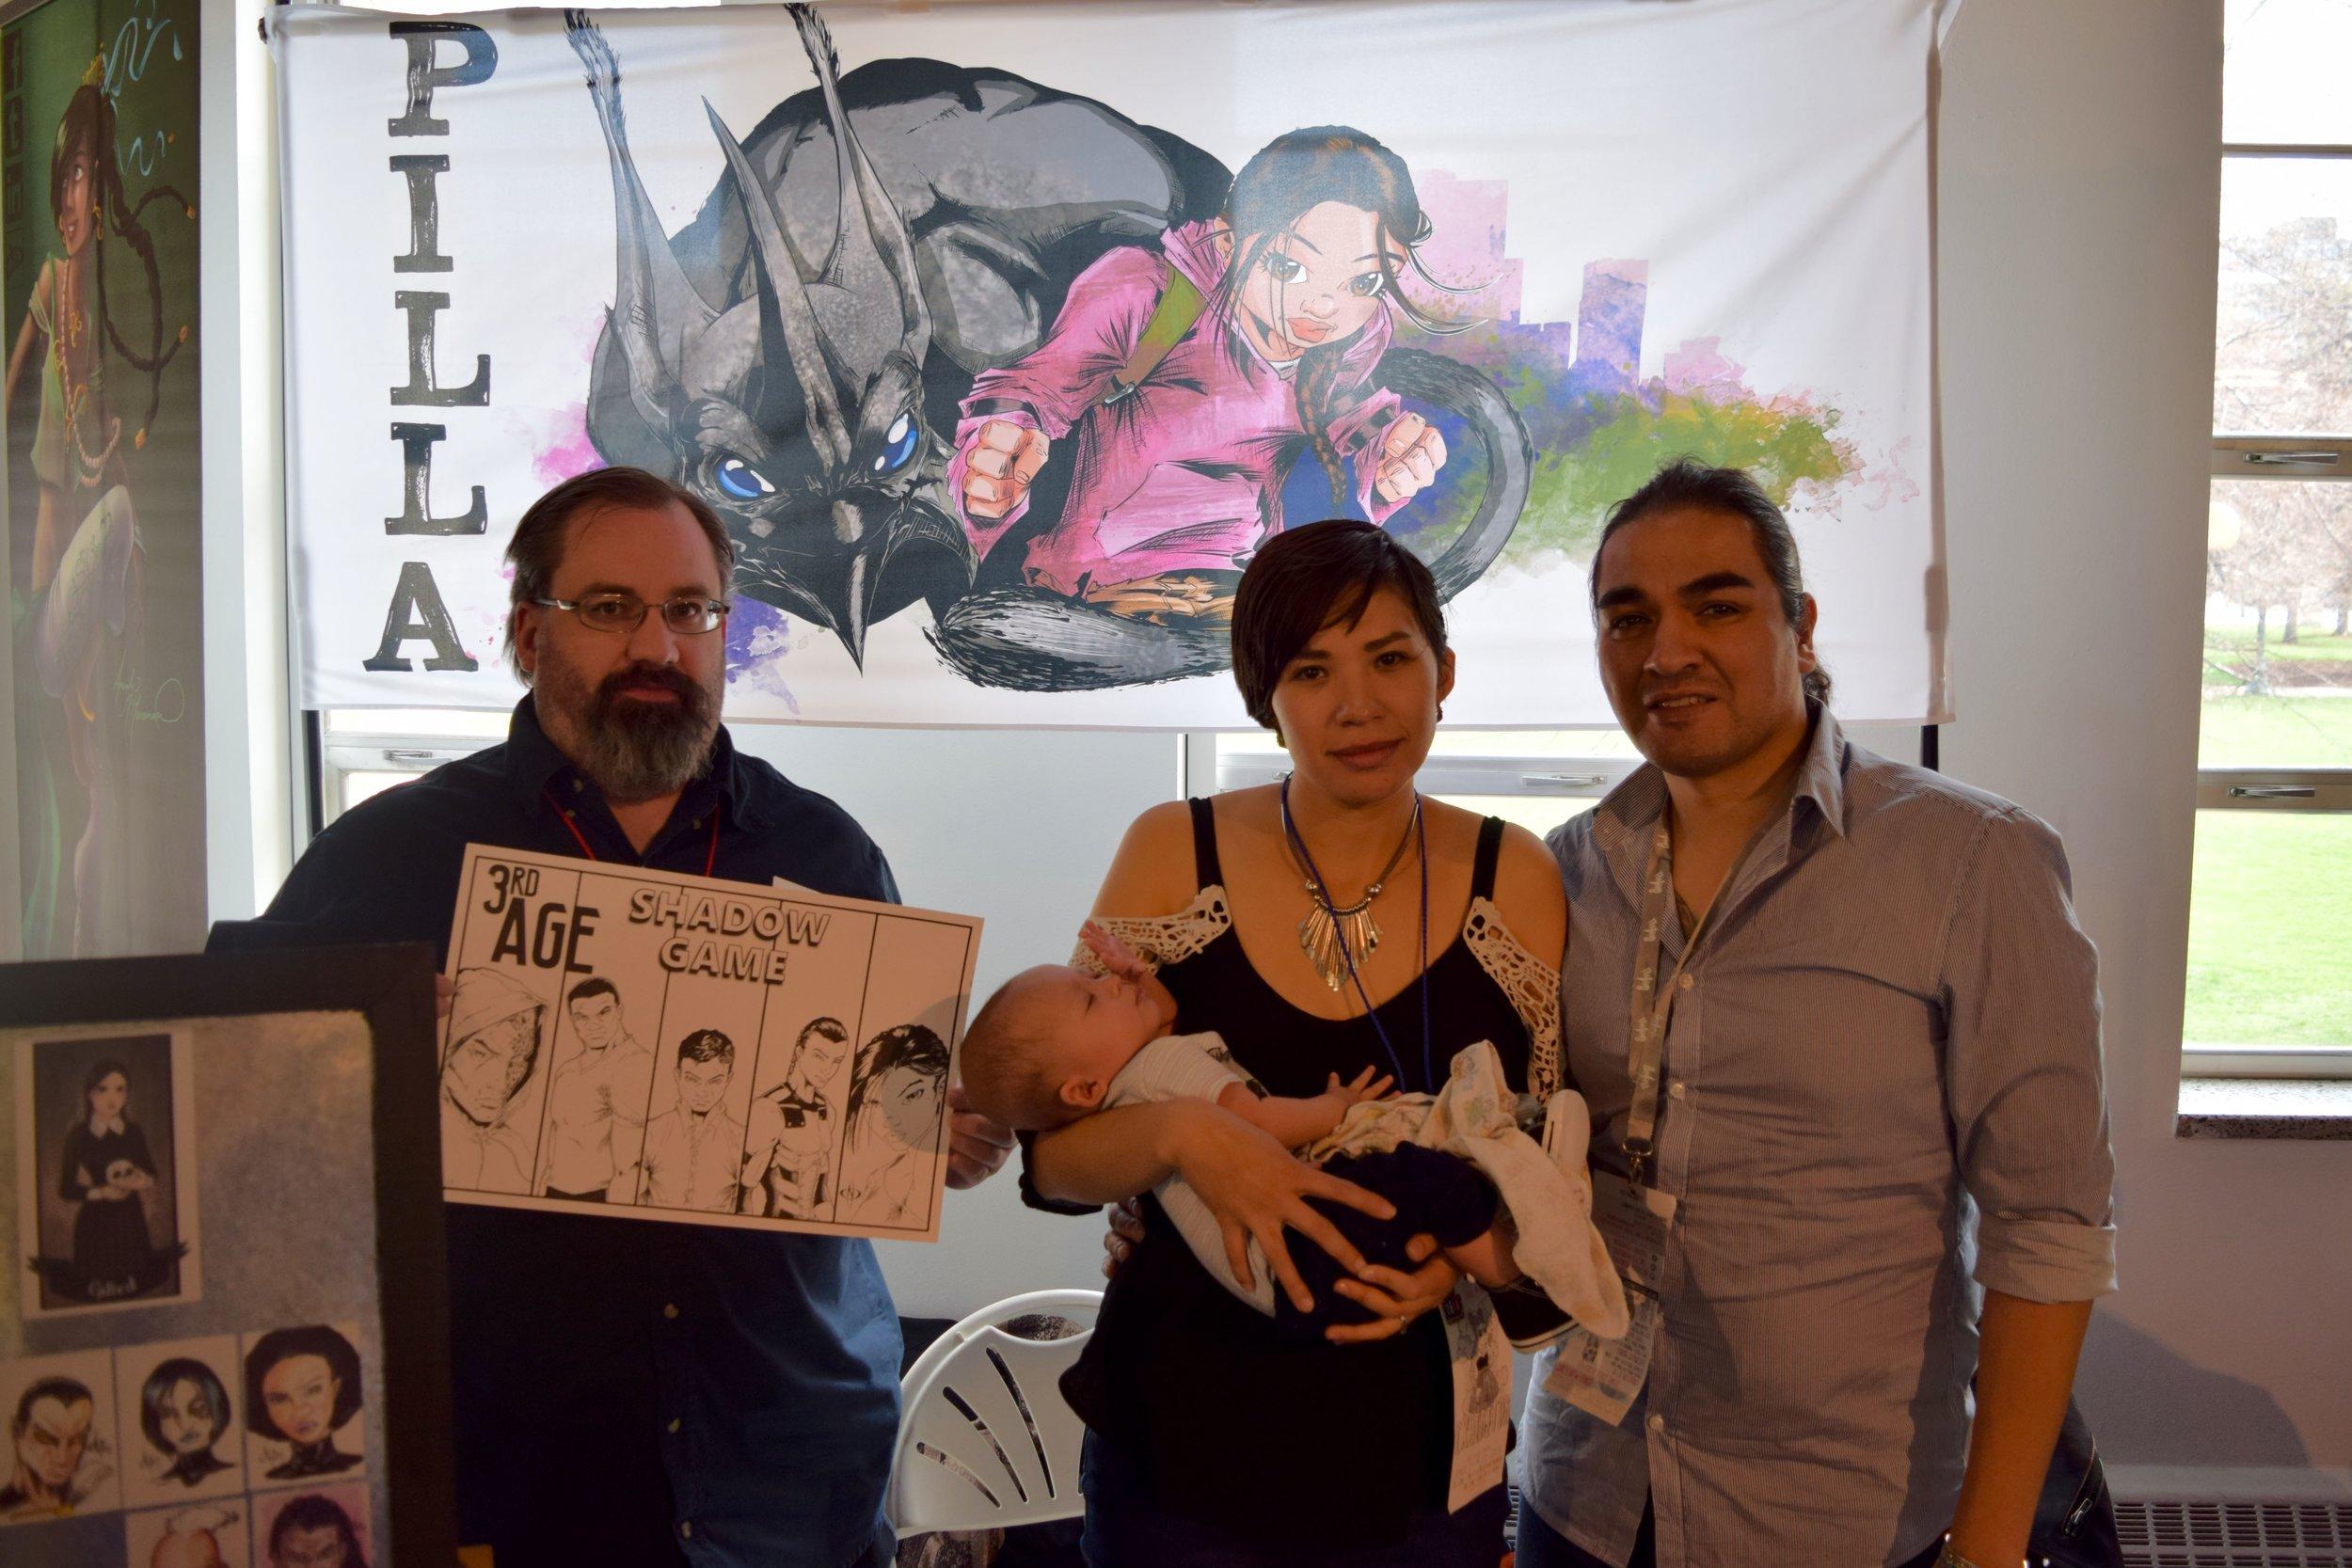 Kevin Butcher with Kristina, Koda, and Rafael Maldonado-Bad Hand at DINK 2018.